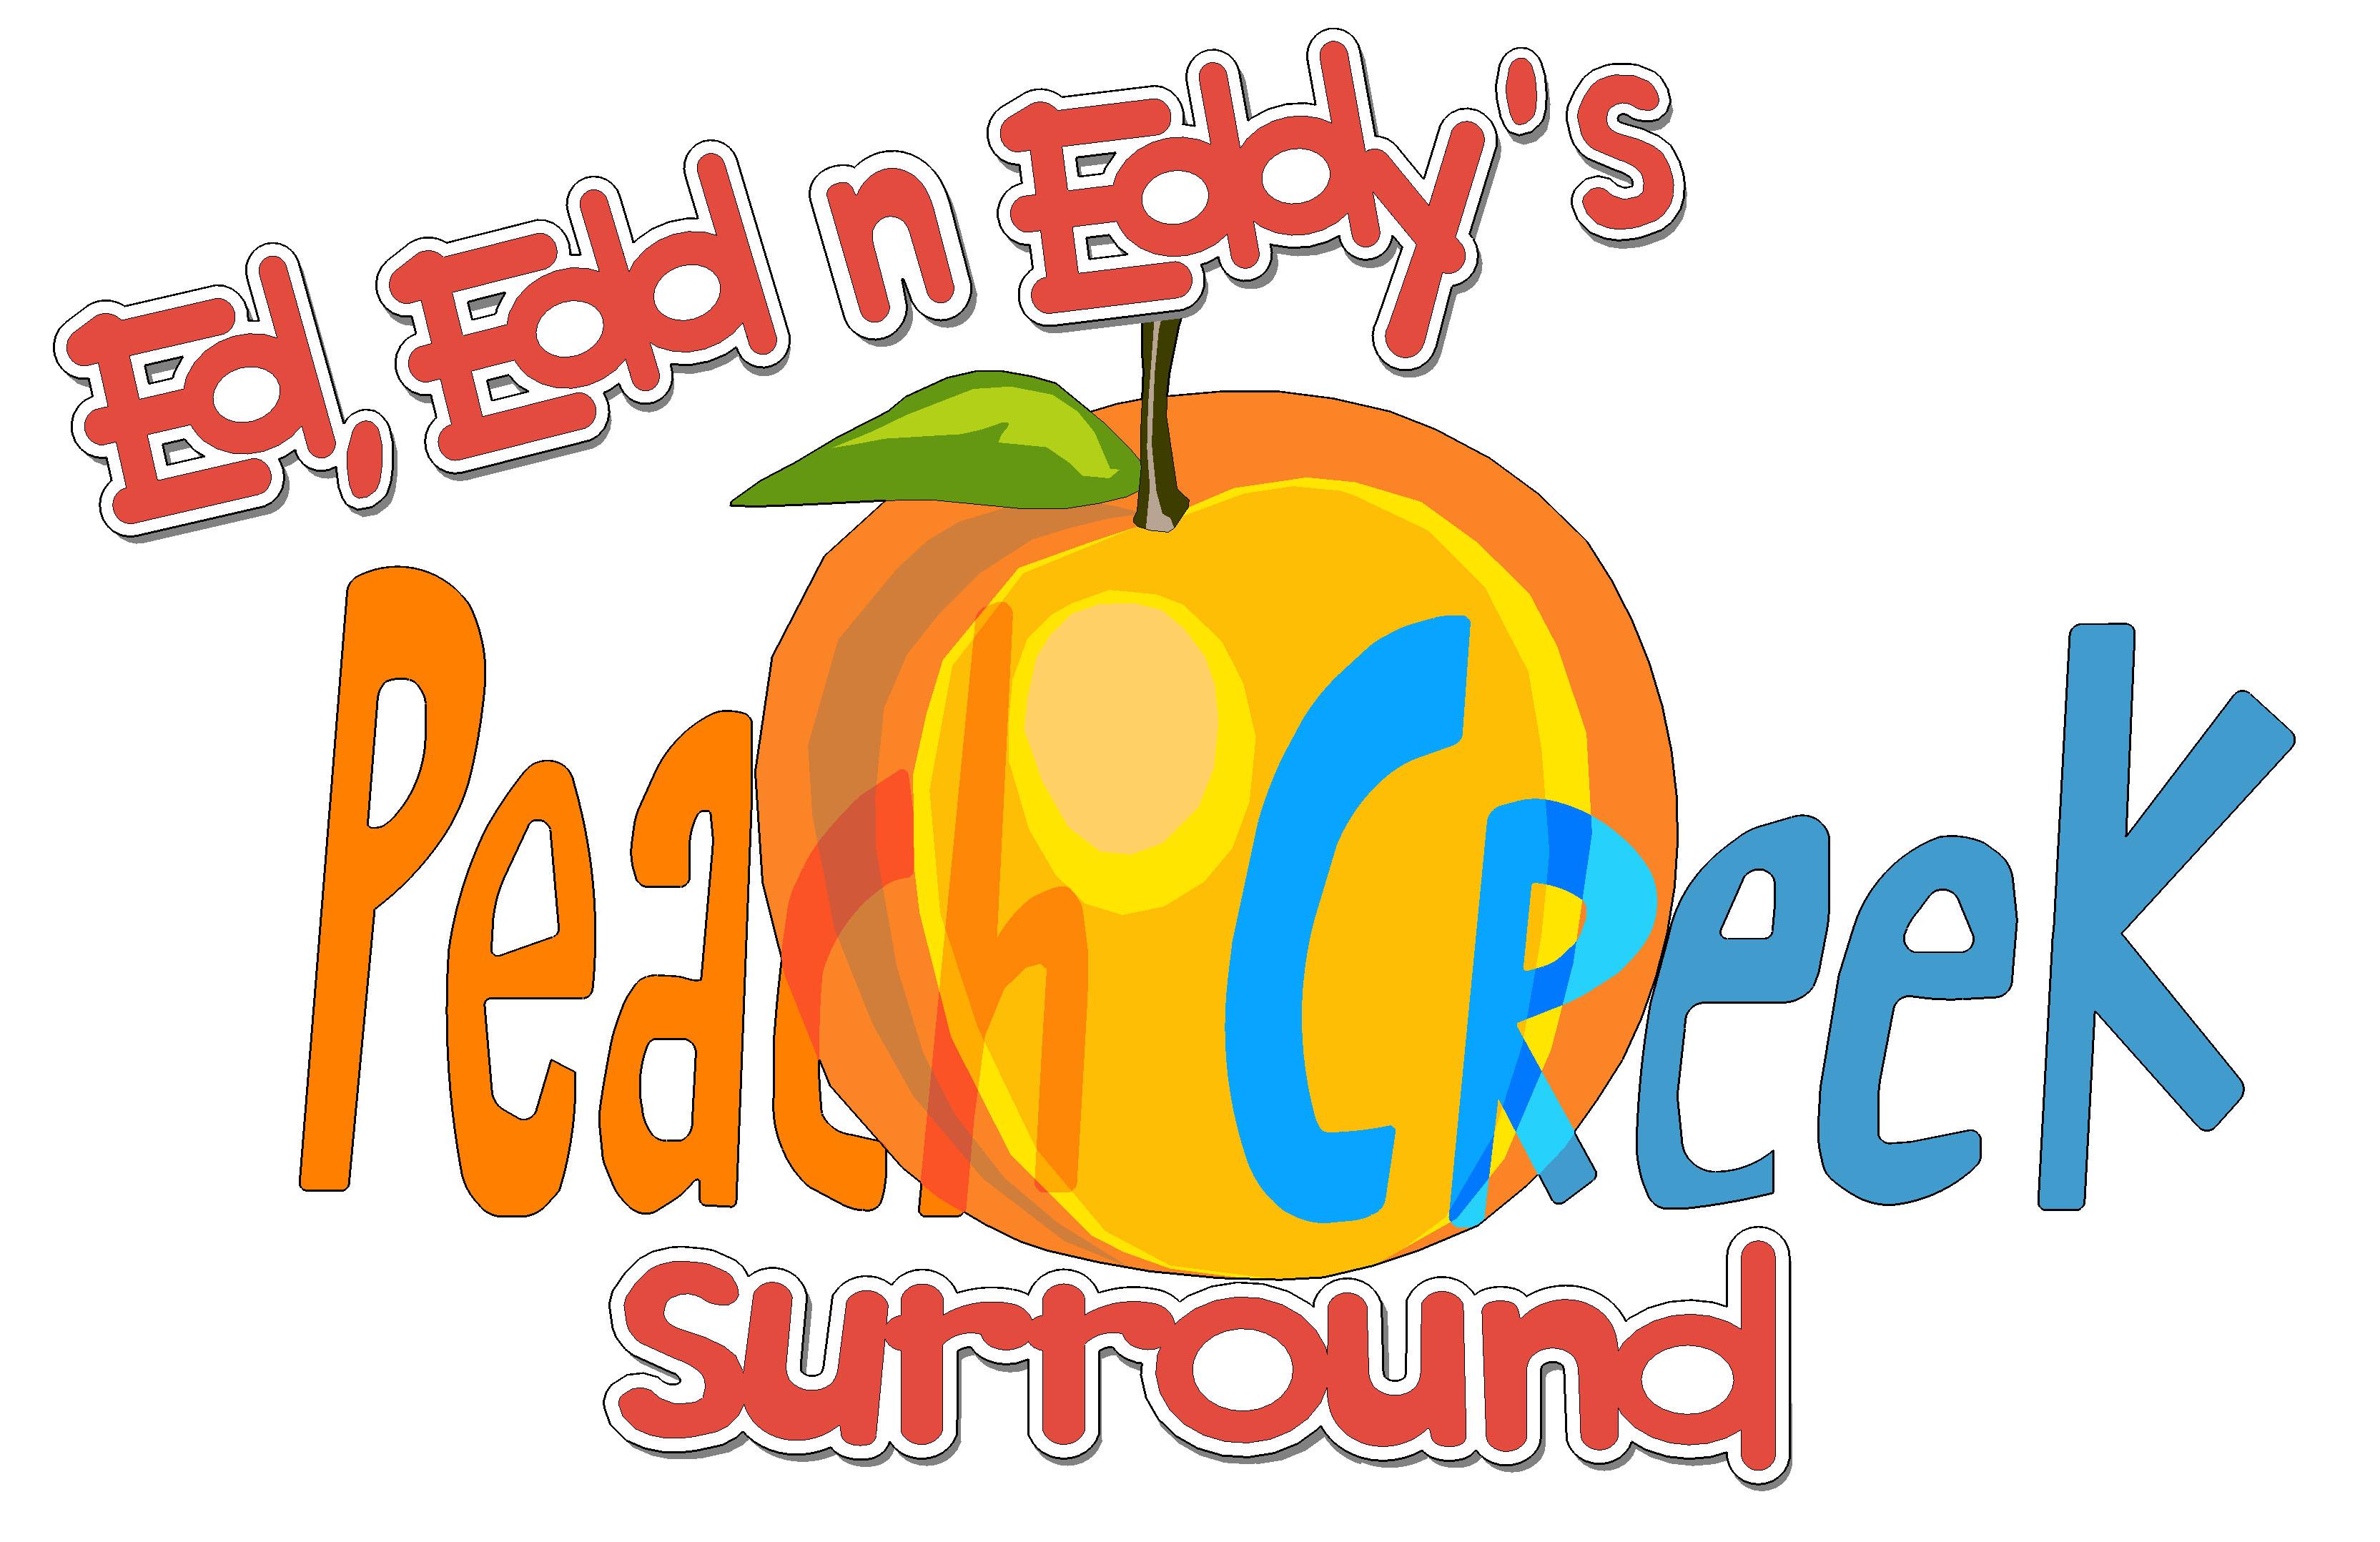 [COMPLETE] Ed, Edd n Eddy`s Peach Creek surround